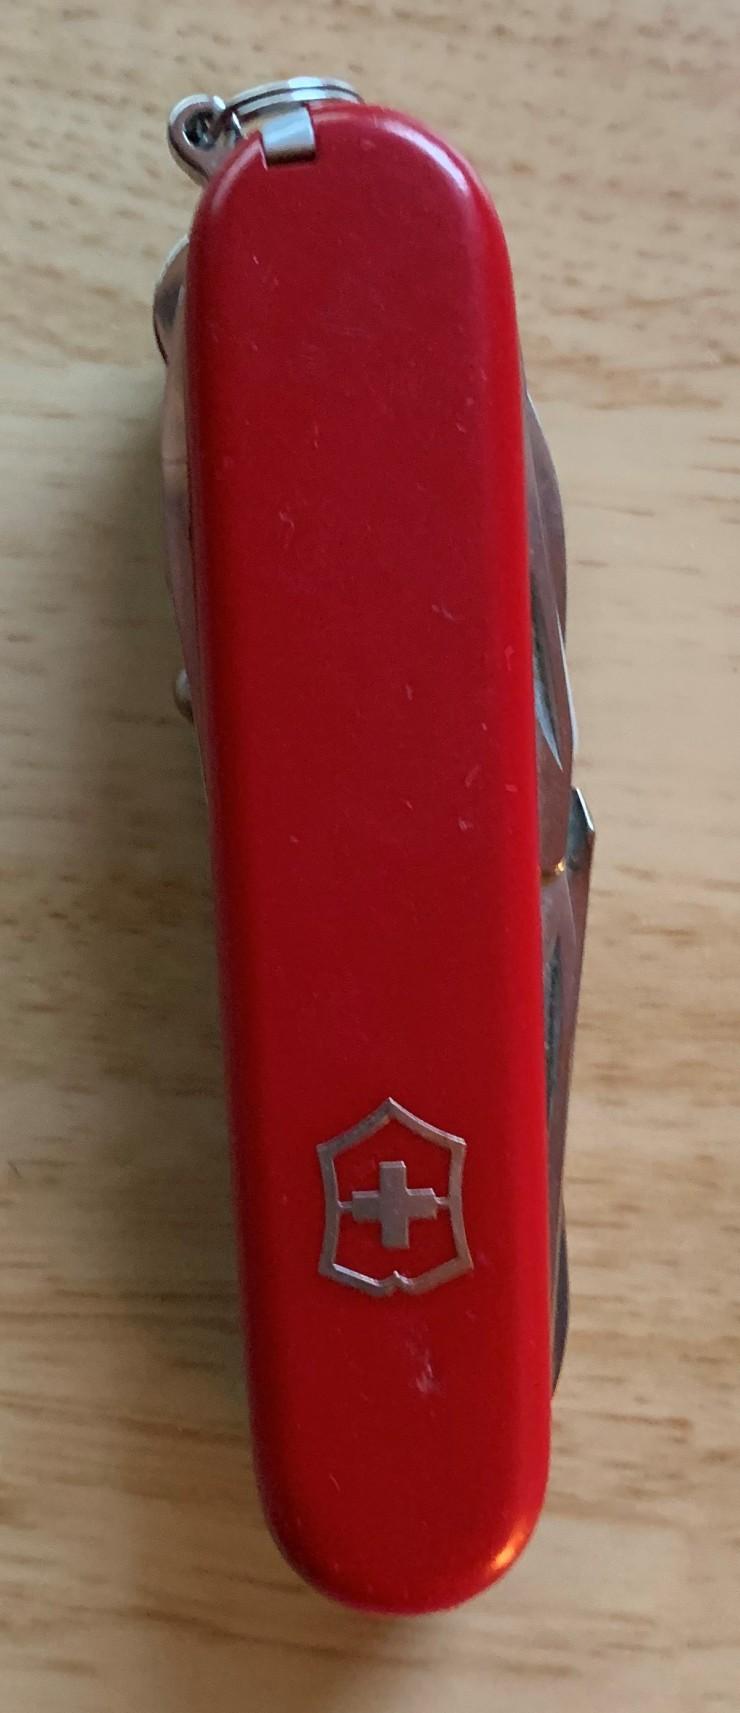 Swiss army knife.JPG